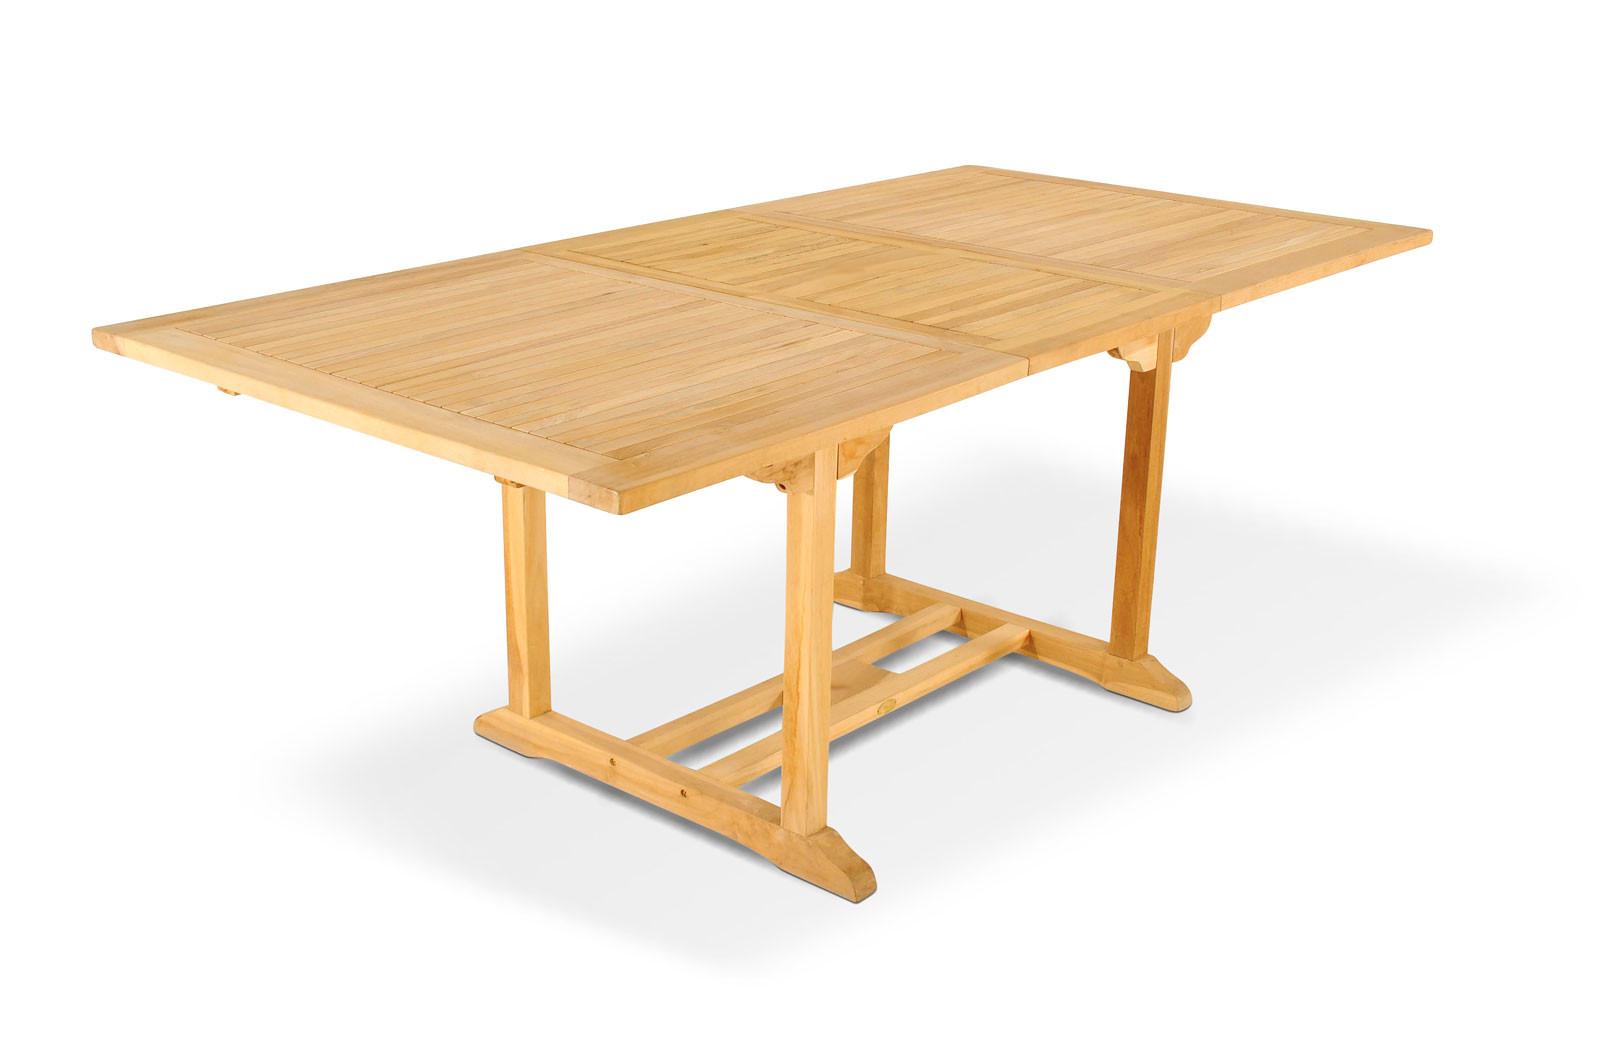 Teakholzmöbel patina  SAM® Gartentisch ausziehbar 150 - 200 cm Teakholz CARACAS